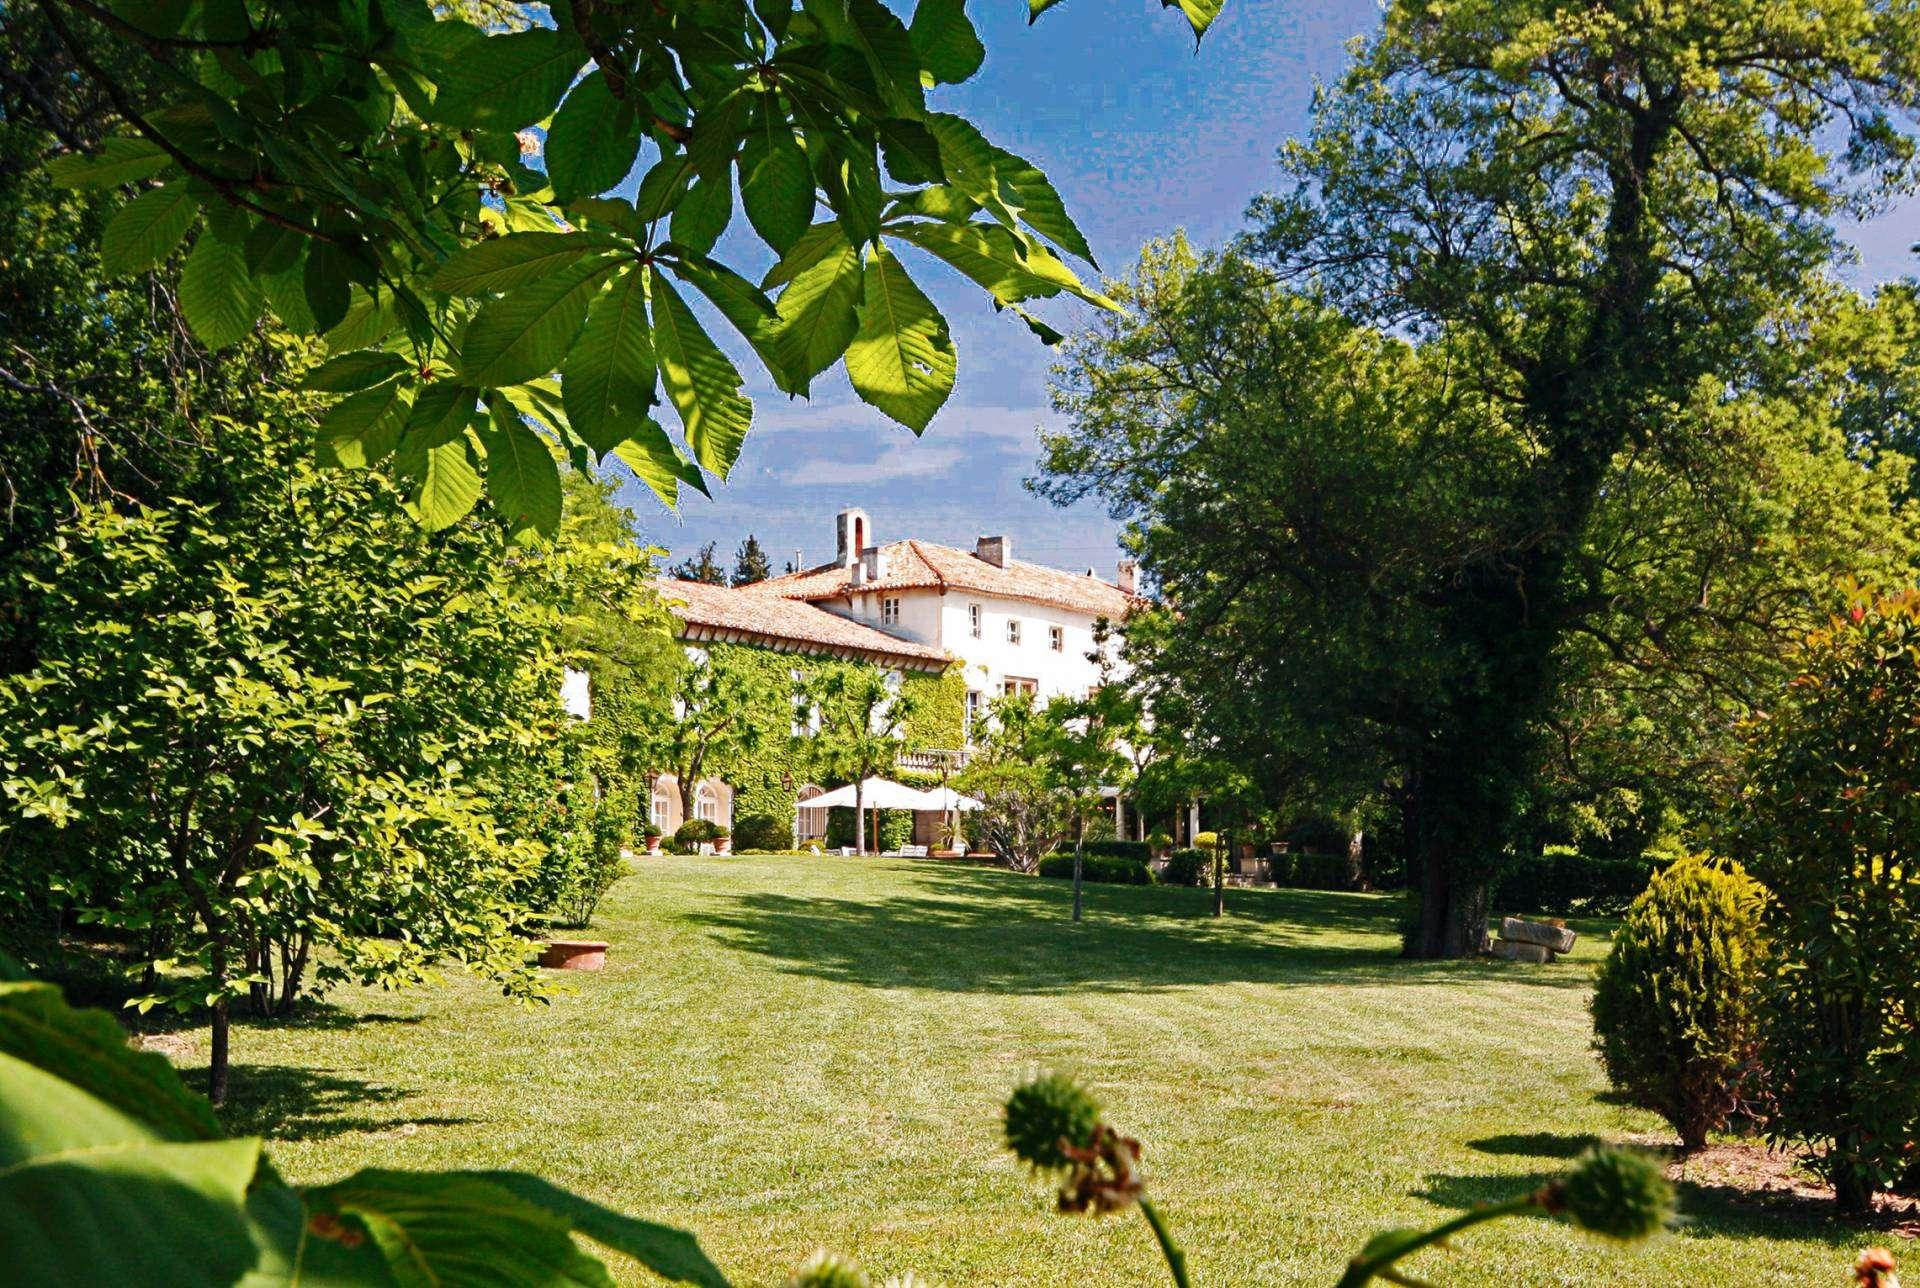 Luxury vacation rentals europe - France - Provence ih - Avi gnon - Chateau de Villeneuve - Image 1/24